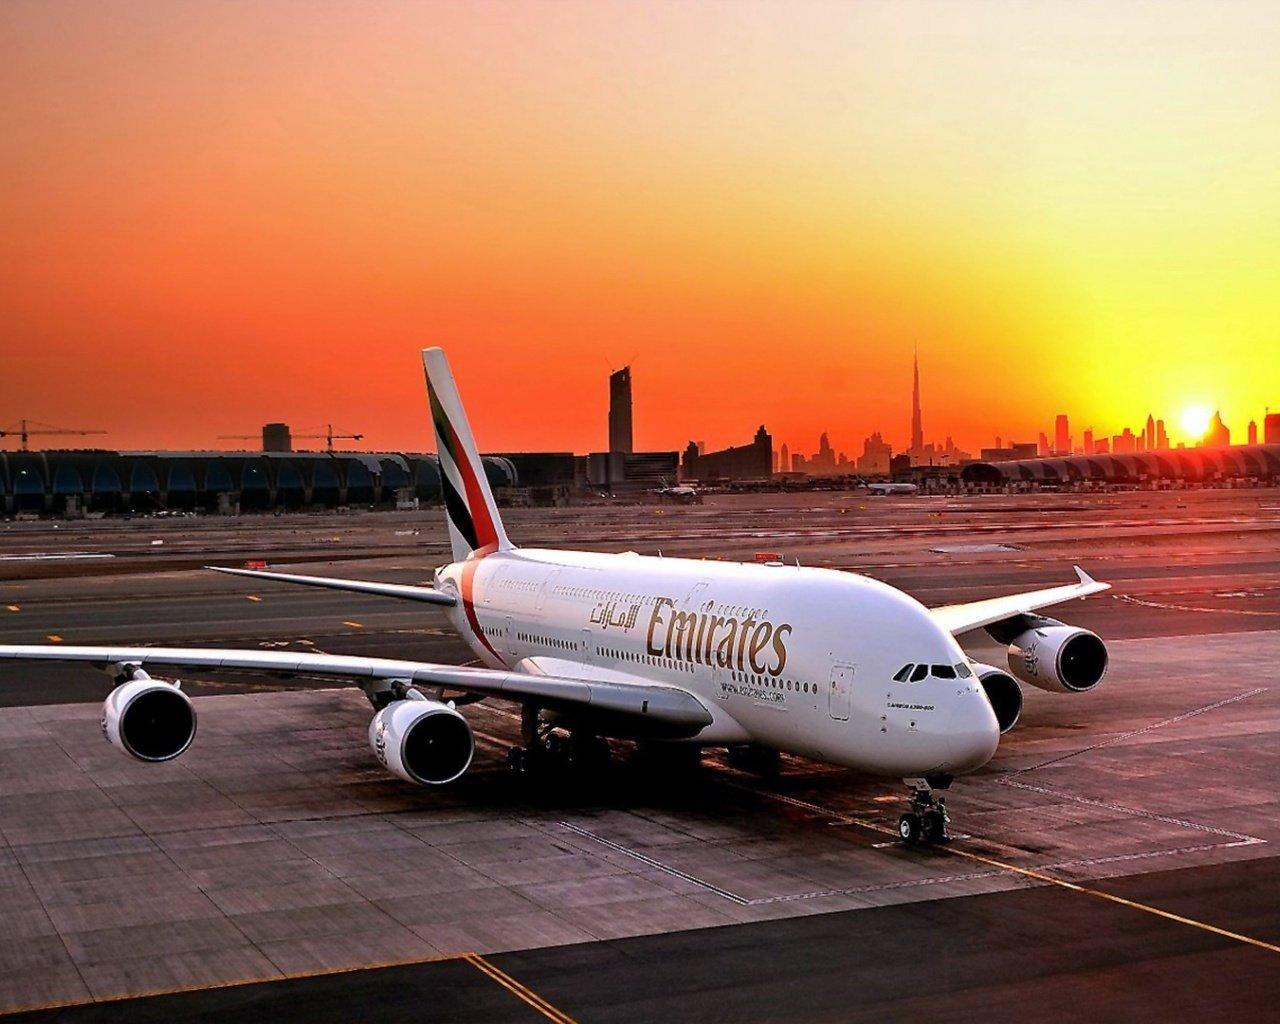 A380 Wallpaper 1280x1024 - WallpaperSafari